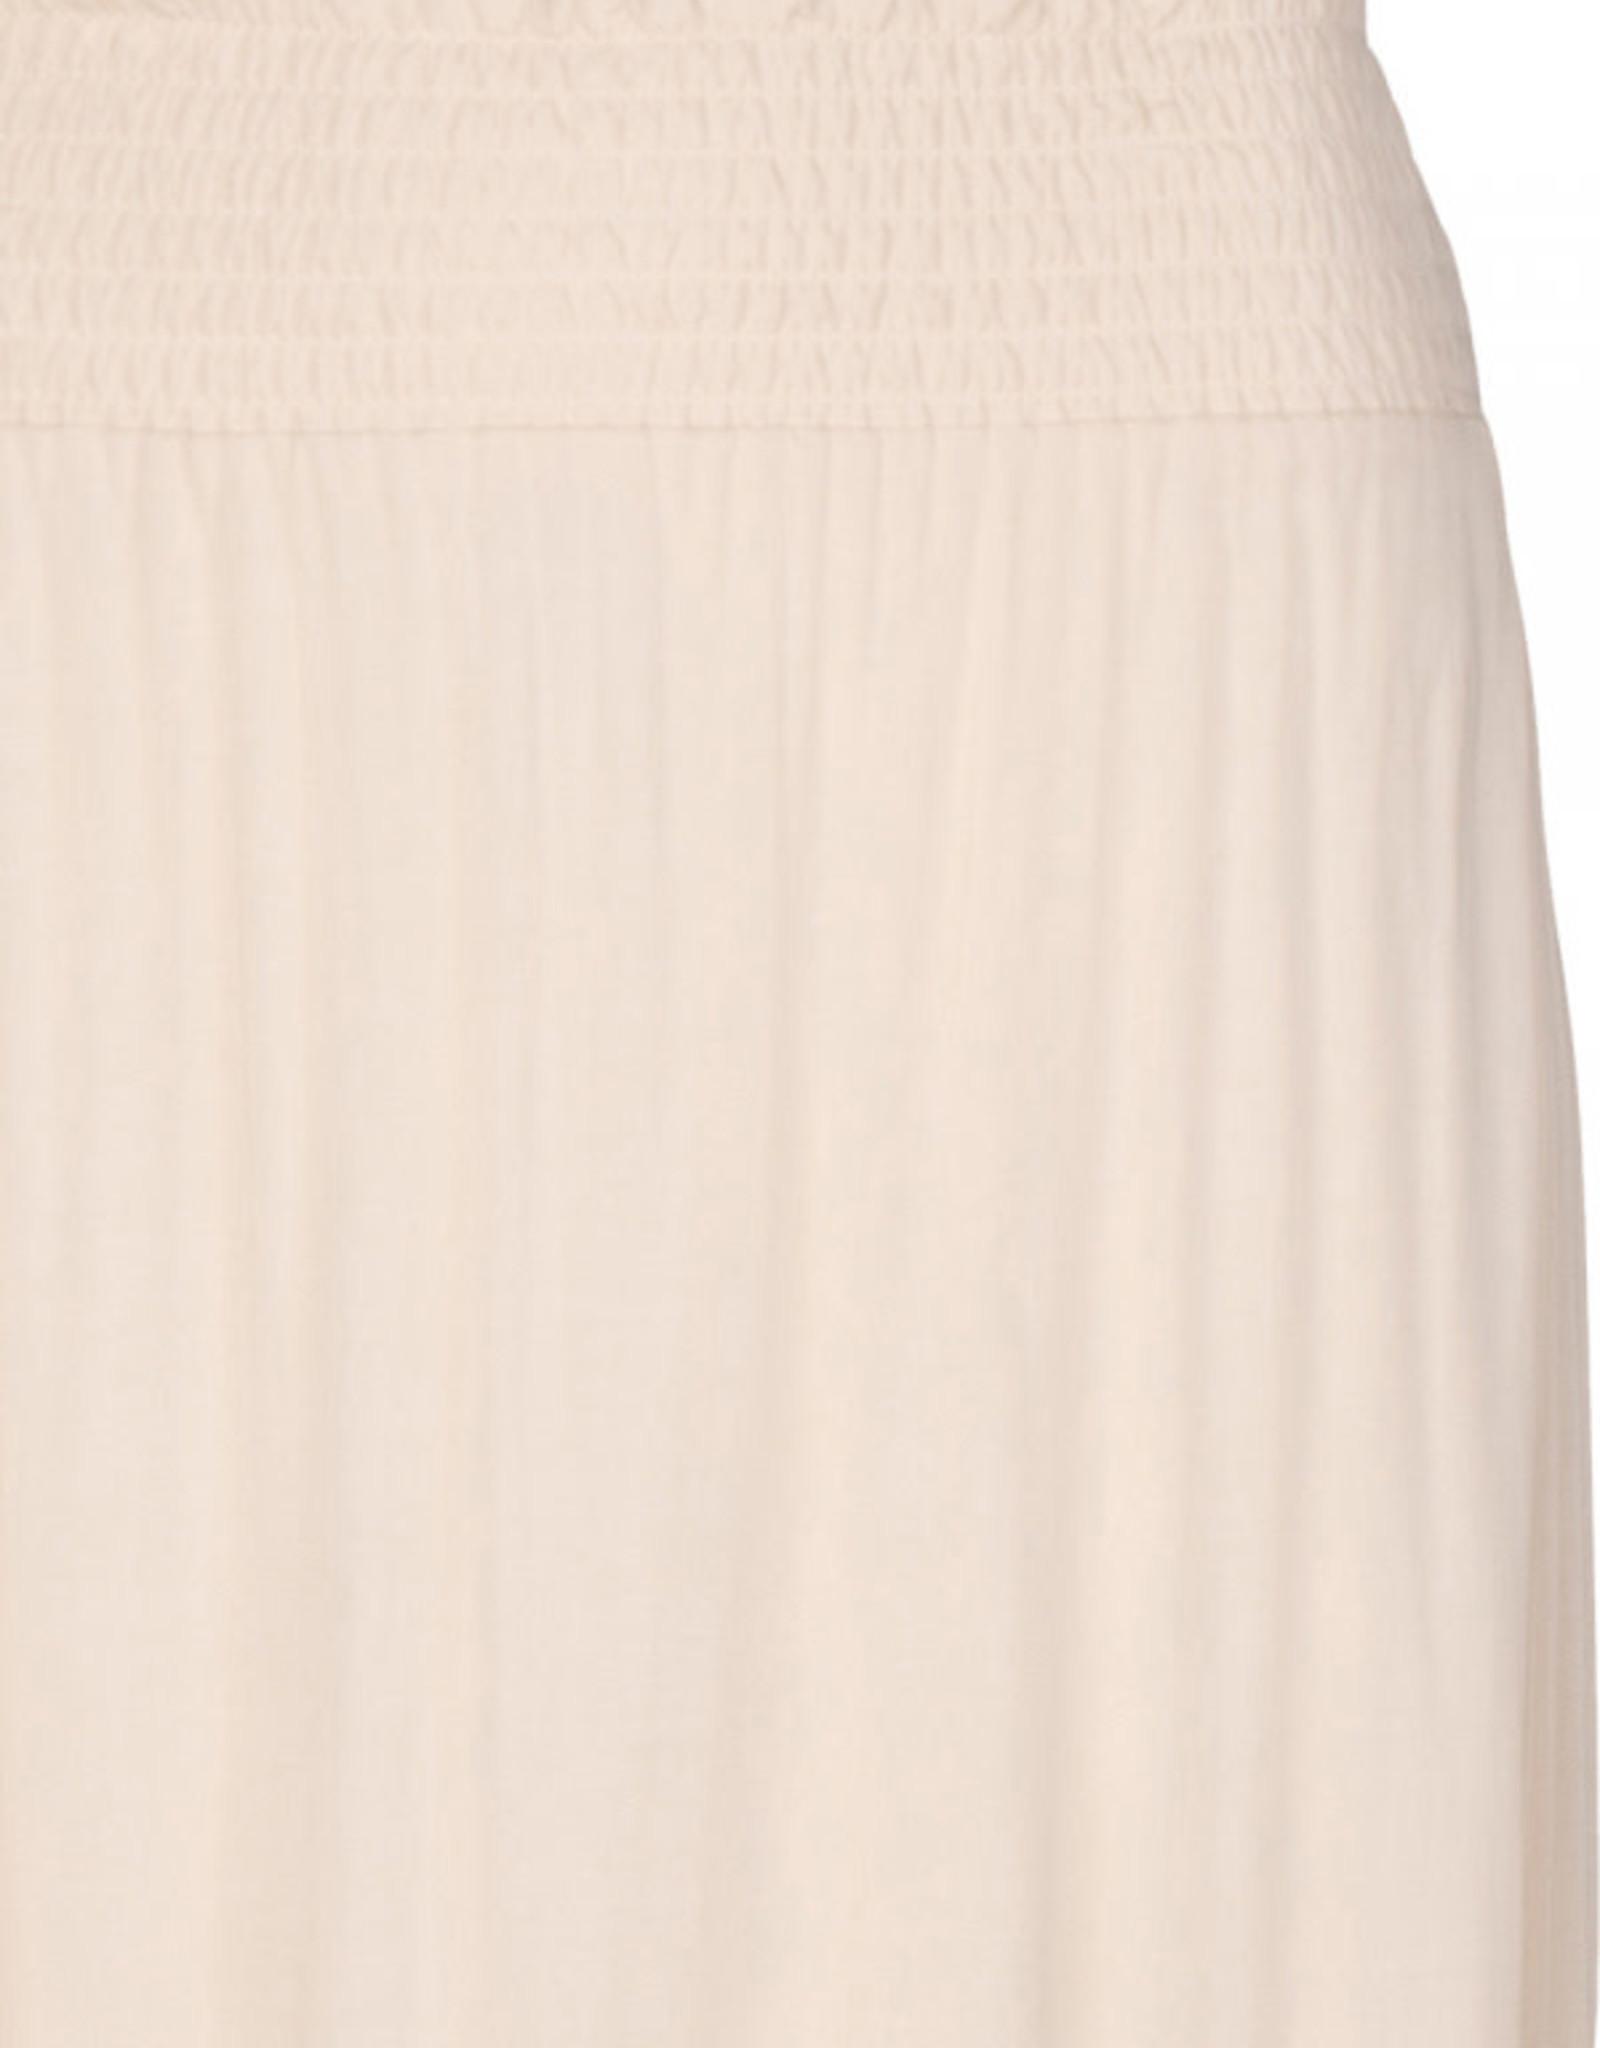 Dante6 Mahina long skirt butter cream